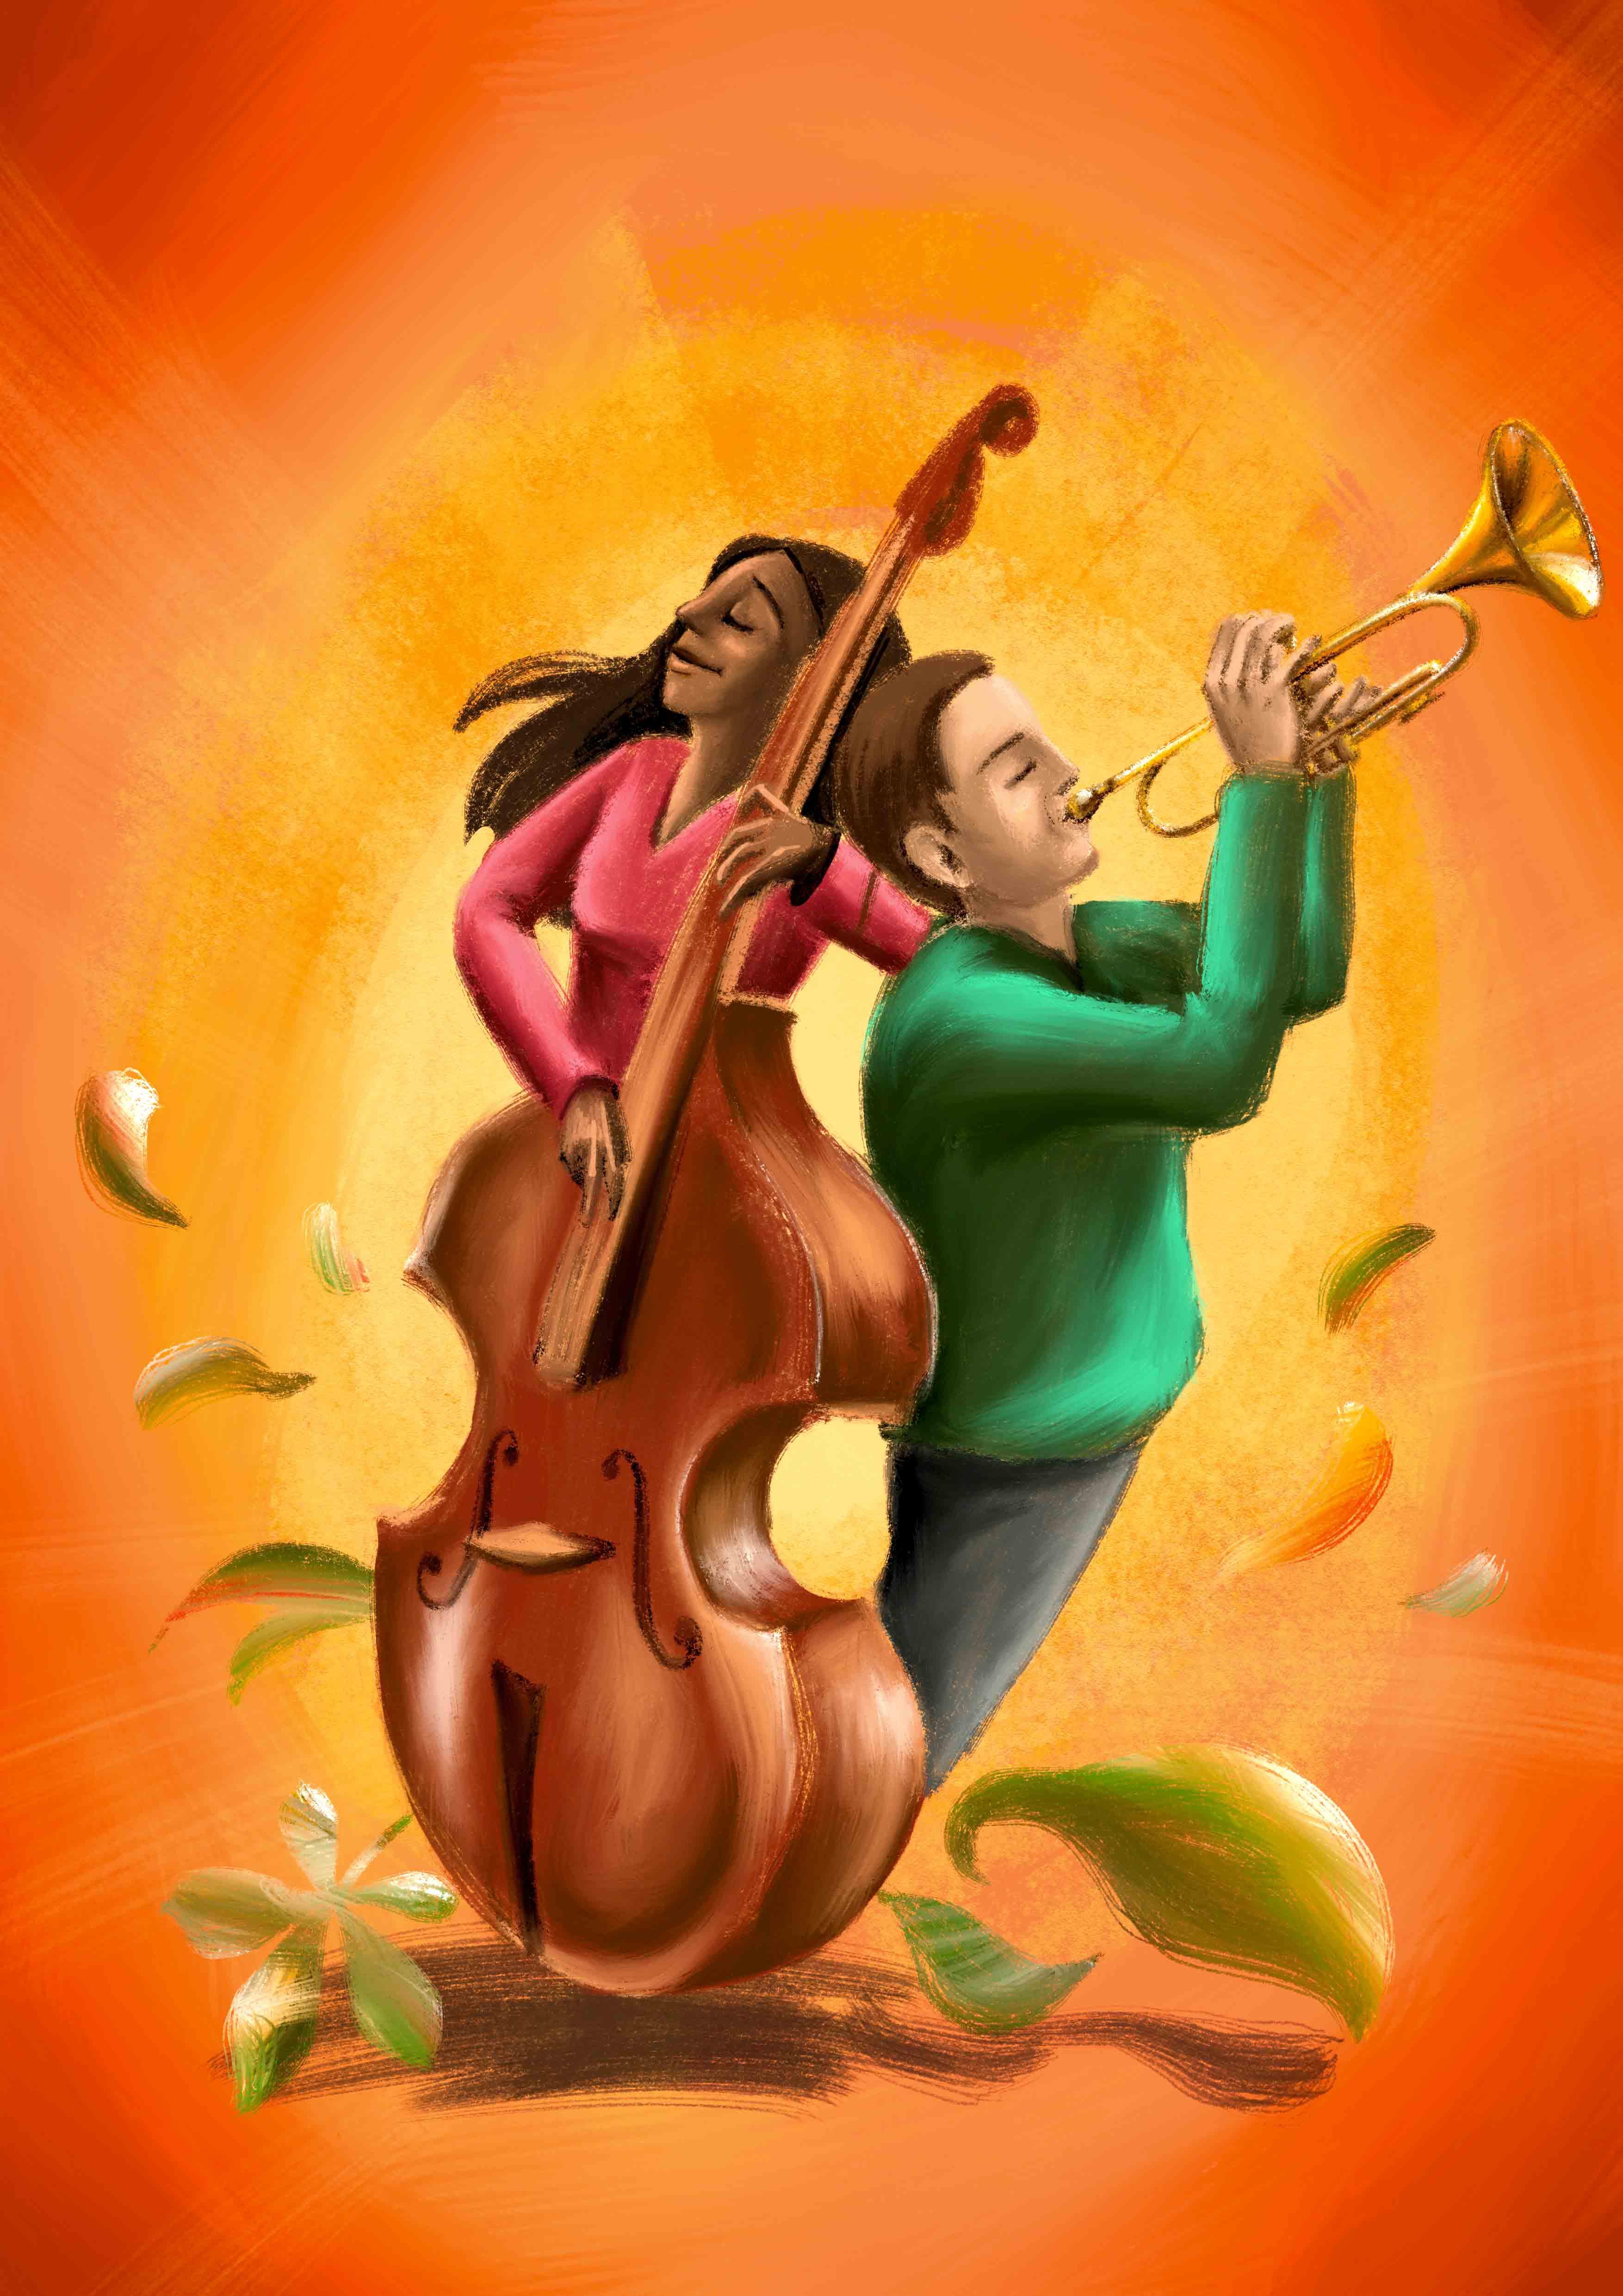 Jazz_Et_Garonne_DXS